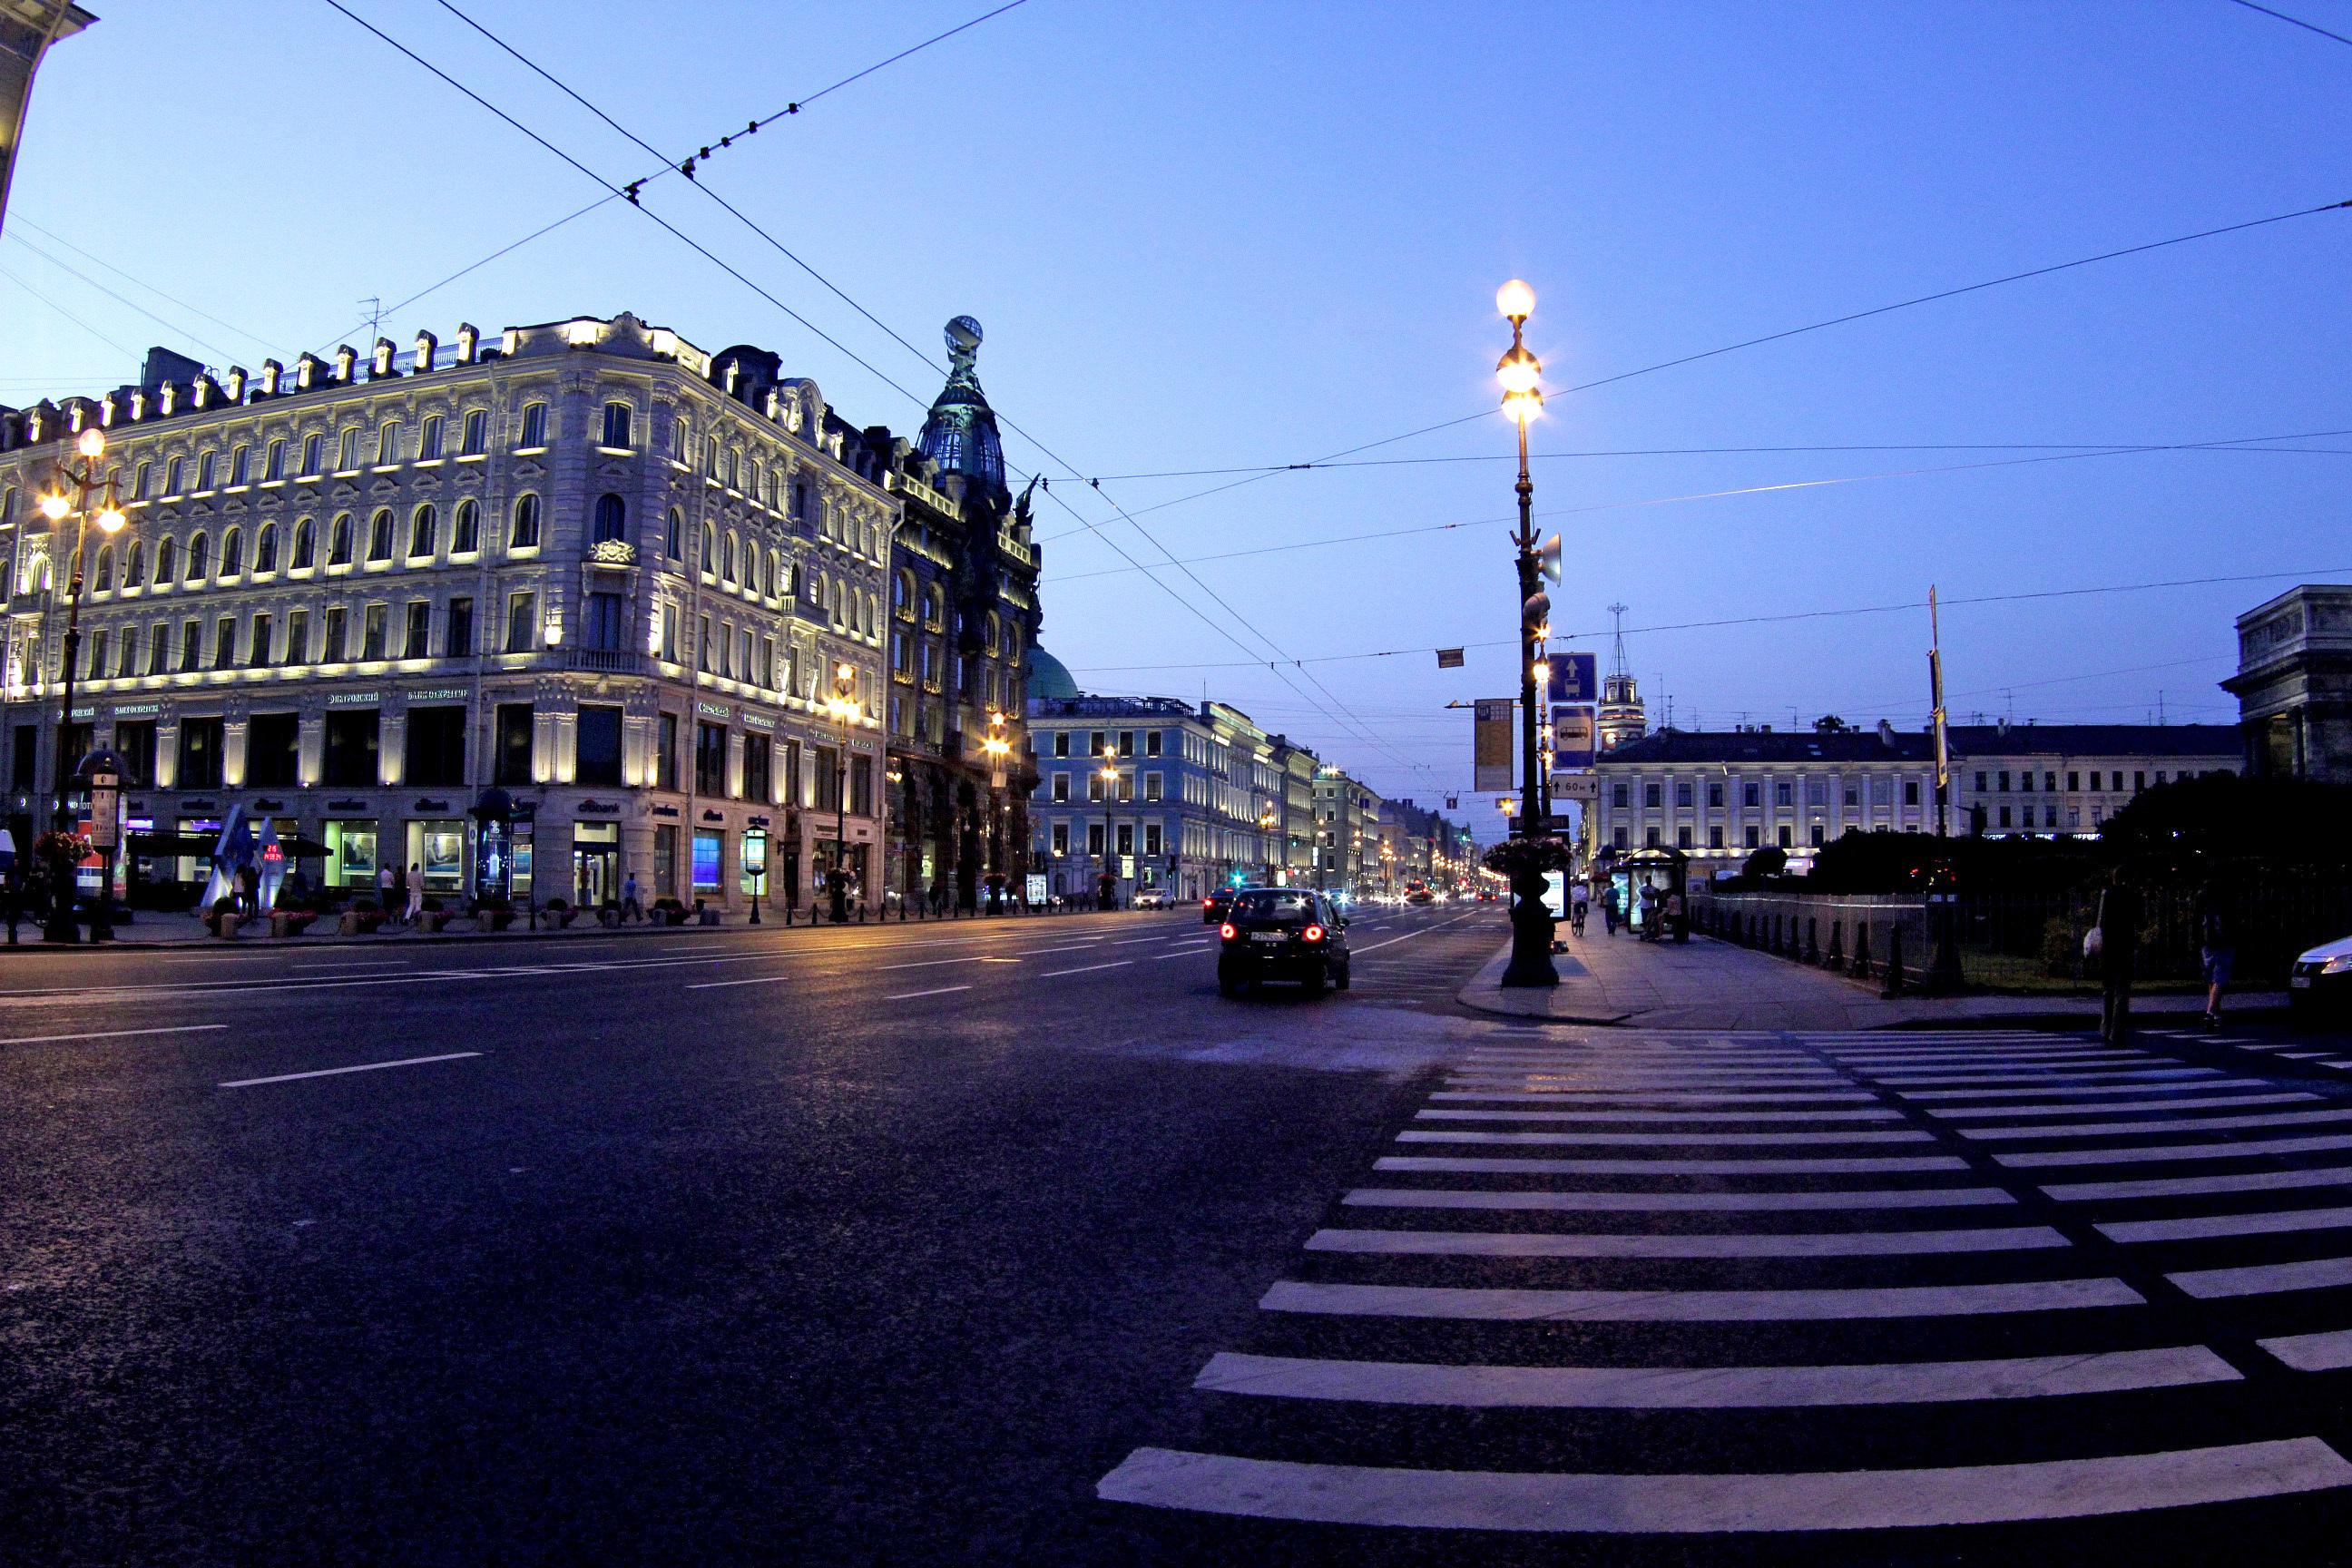 питер картинки улица завидной регулярностью